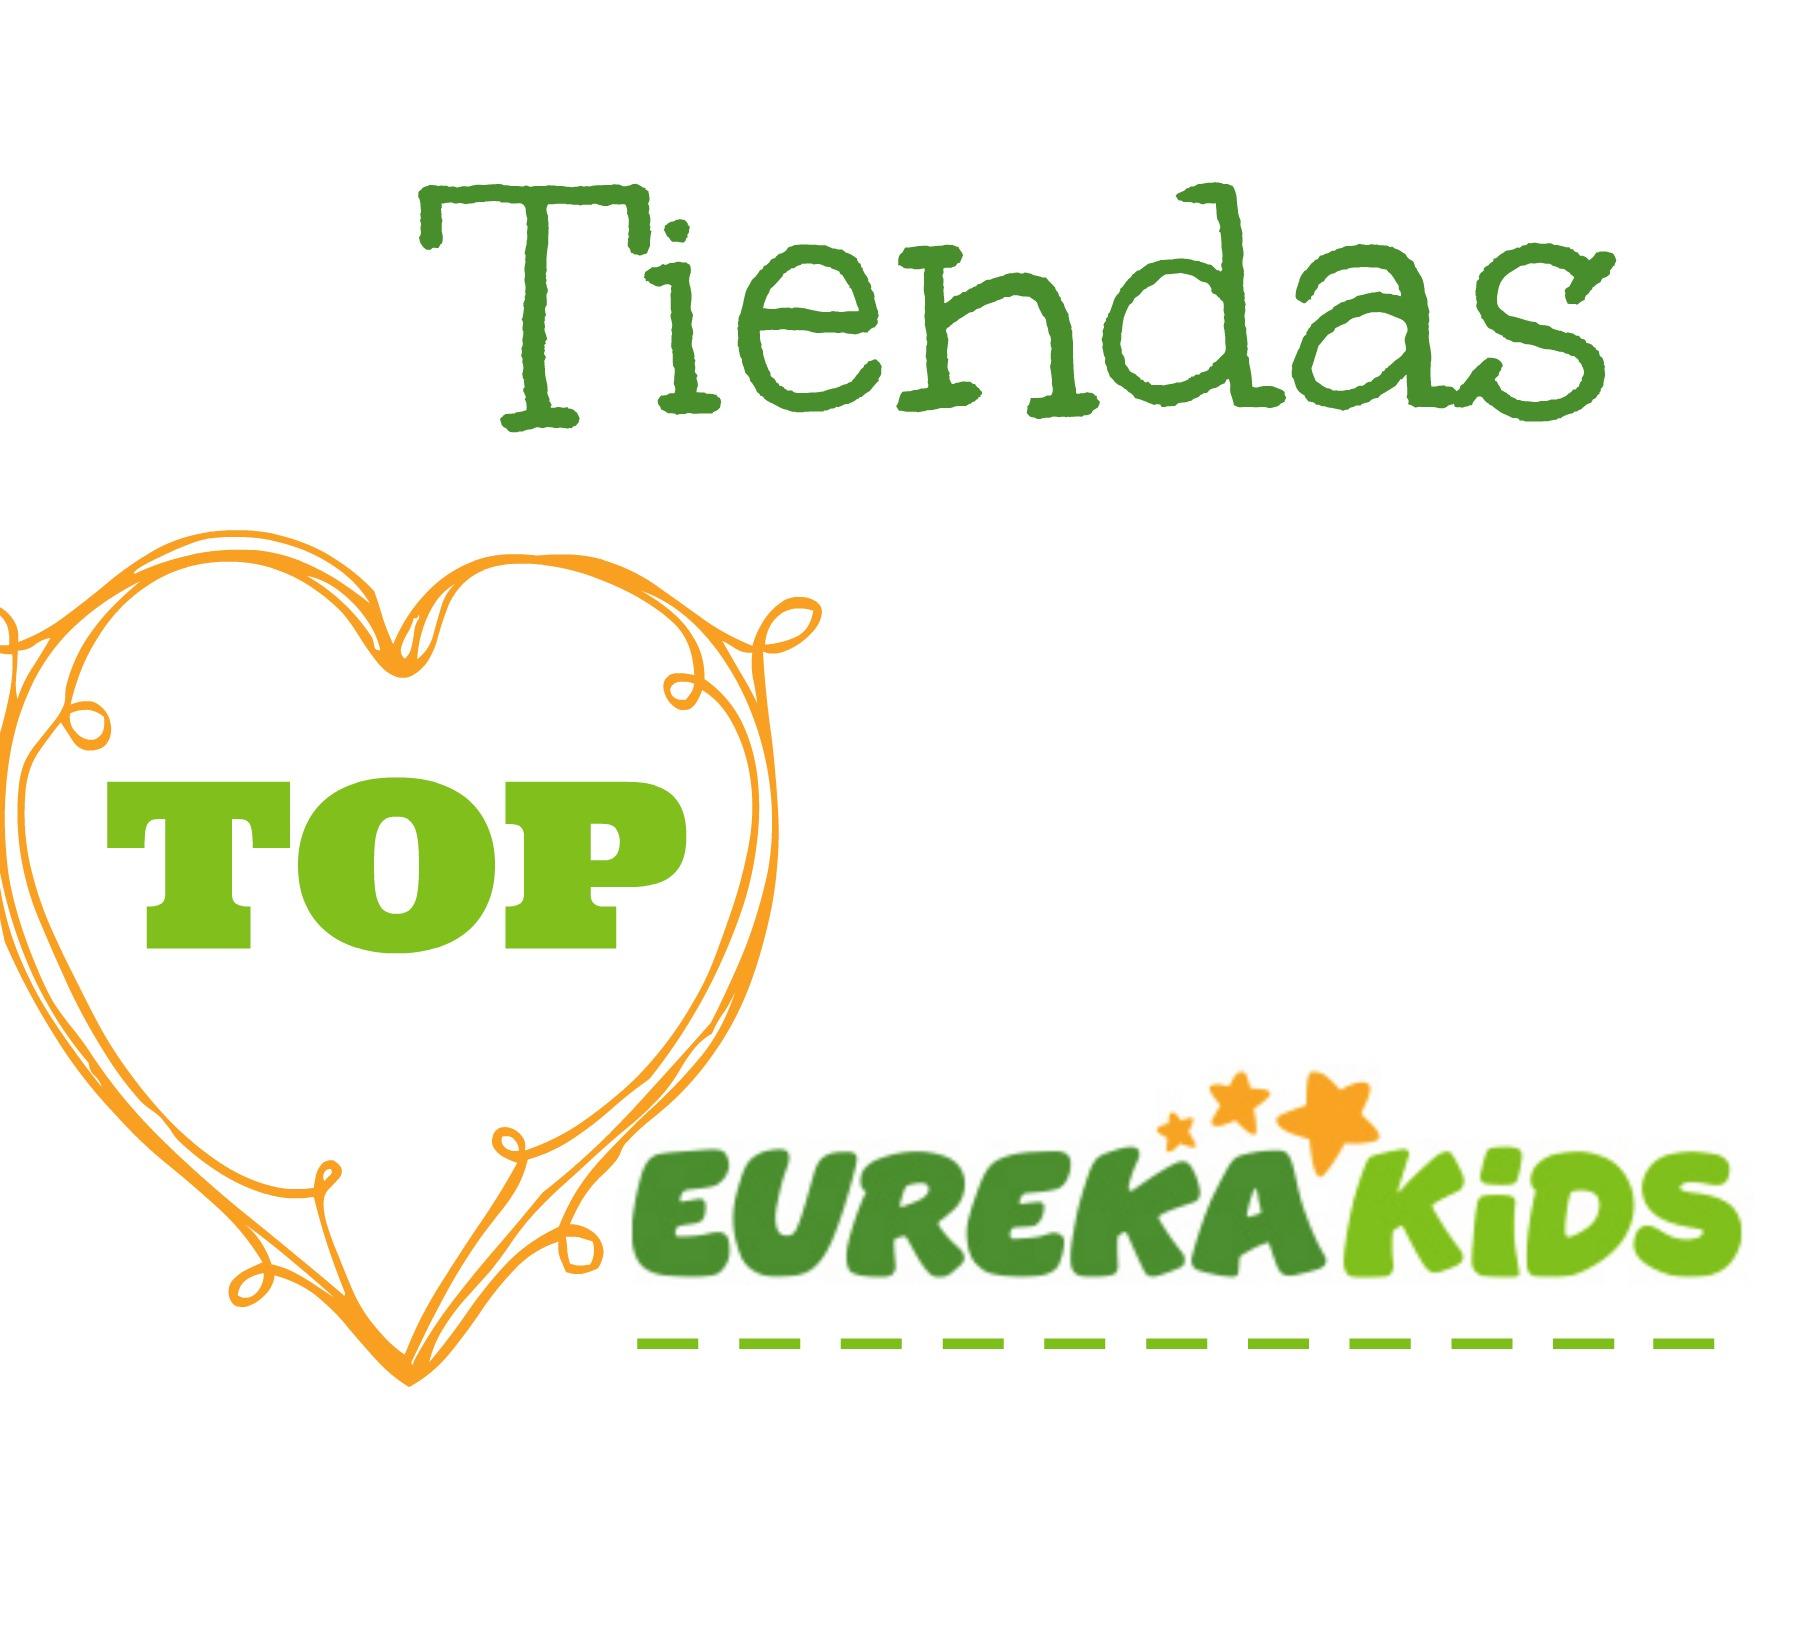 Tiendas top eureka kids, persistencia o cambio, mar vidal, juguetes, play, actividades